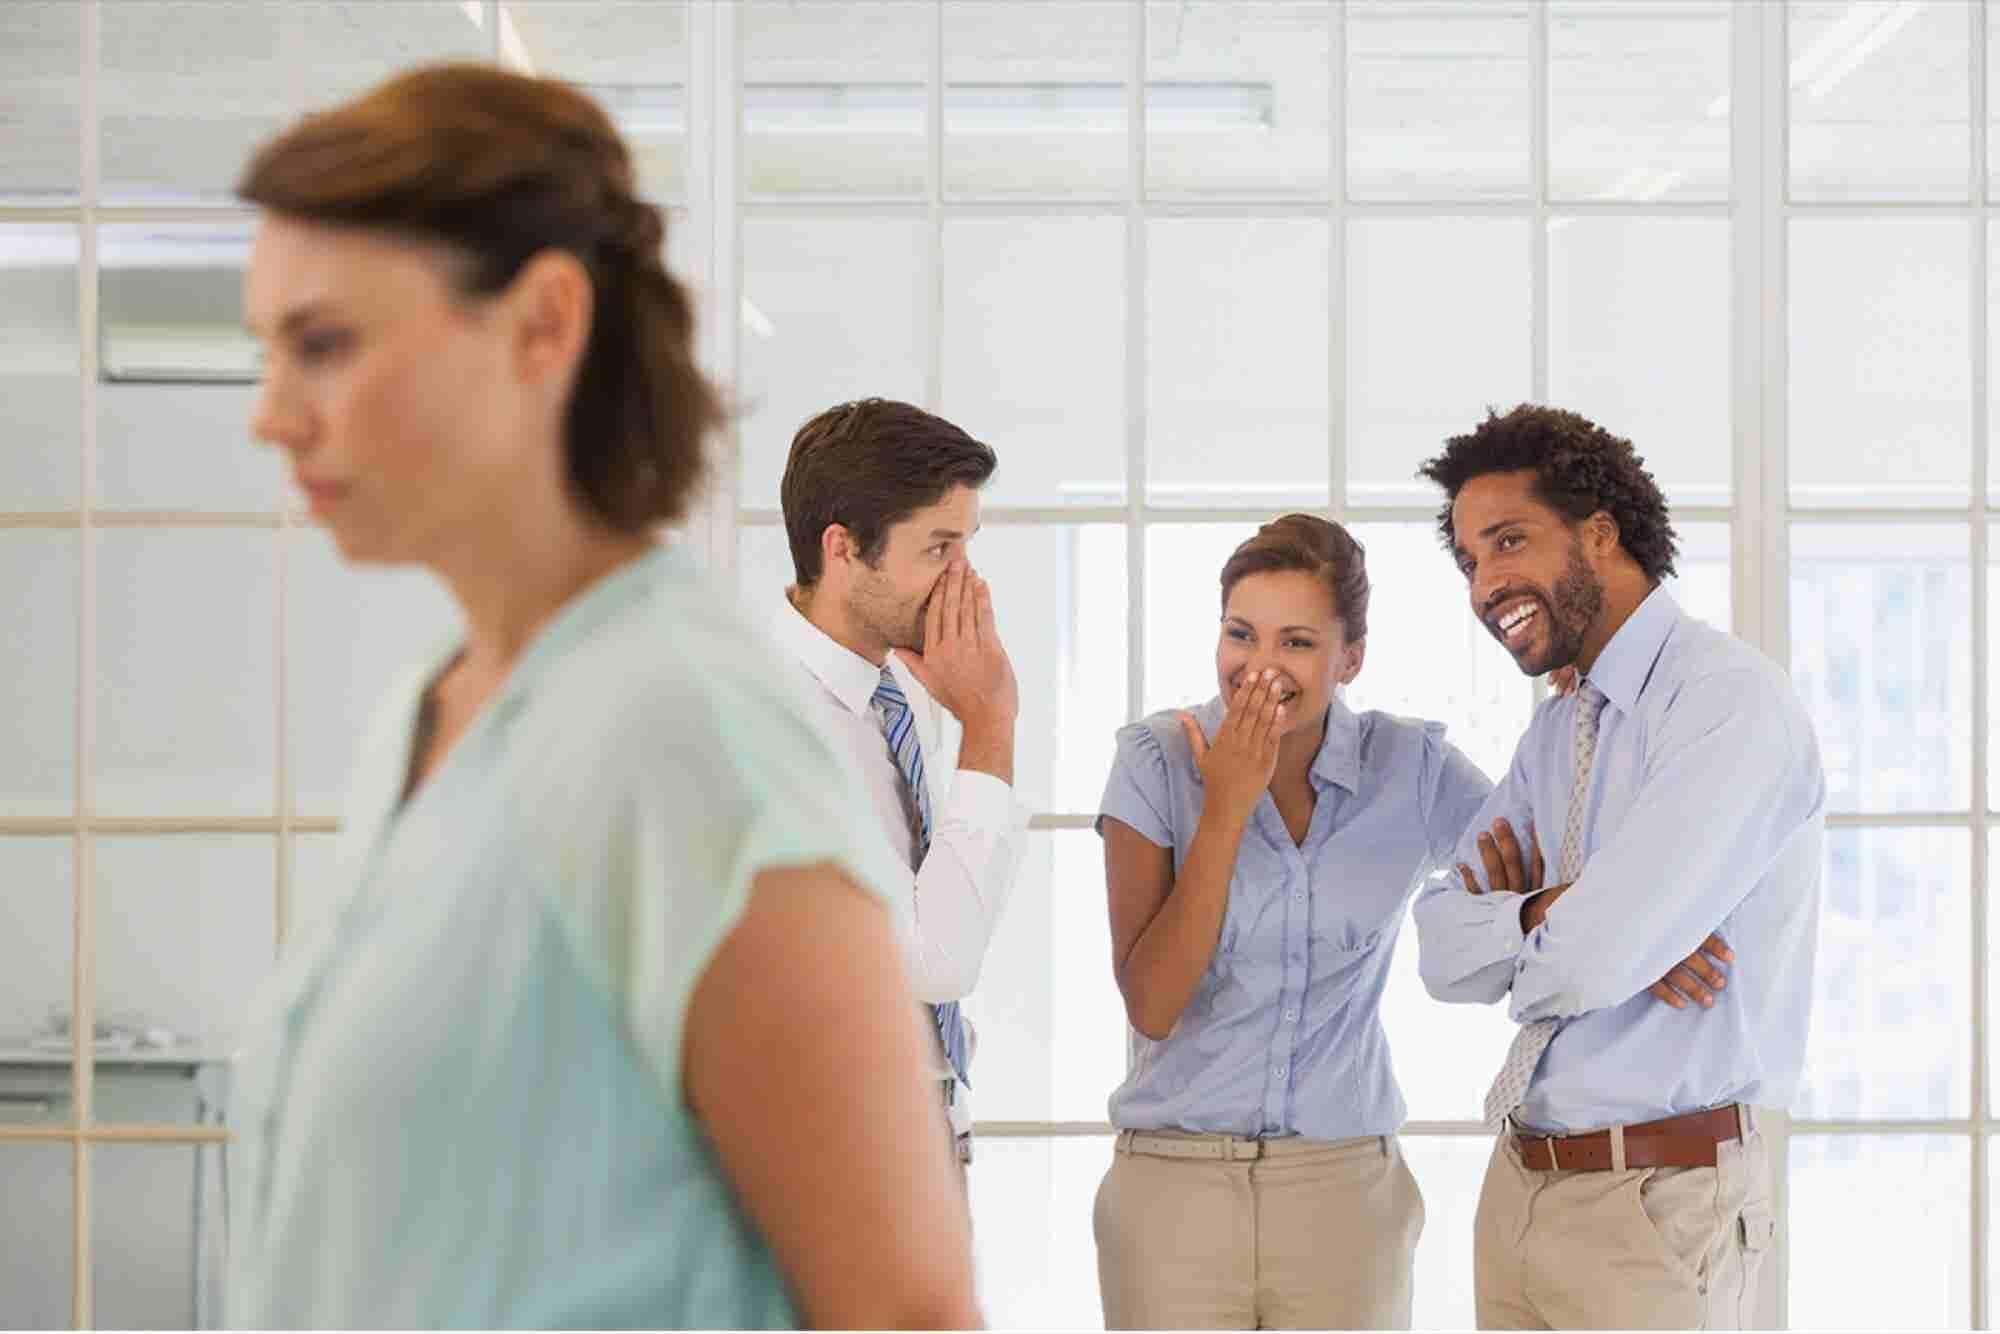 8 Ways You're Sabotaging Your Work Reputation